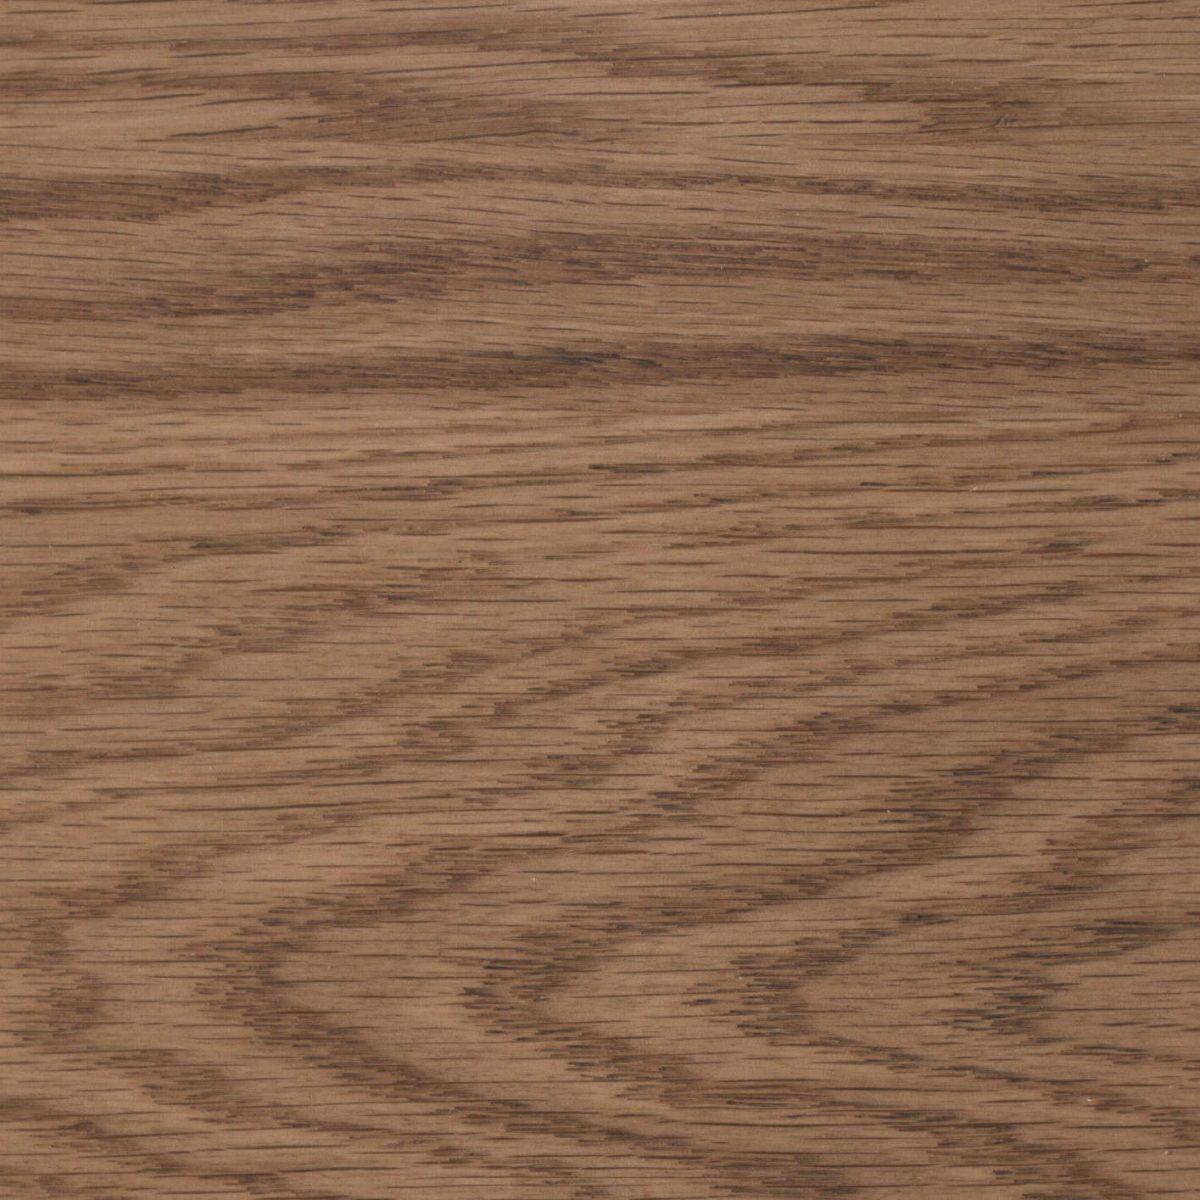 22 Oak Wood Sample